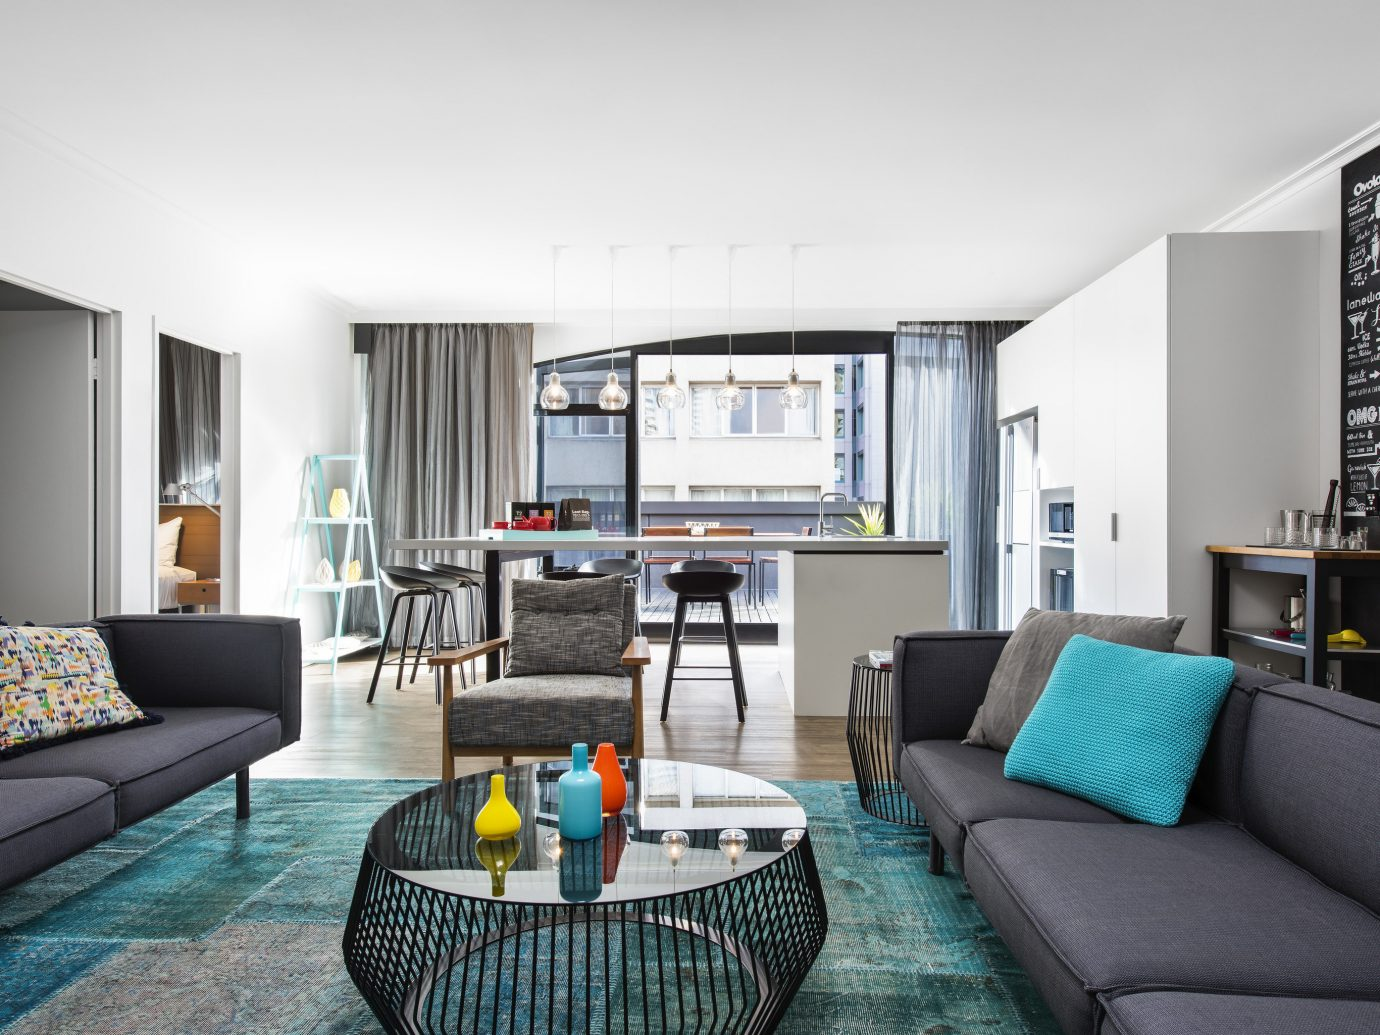 Australia Hotels Melbourne living room room interior design real estate Suite apartment interior designer angle penthouse apartment window